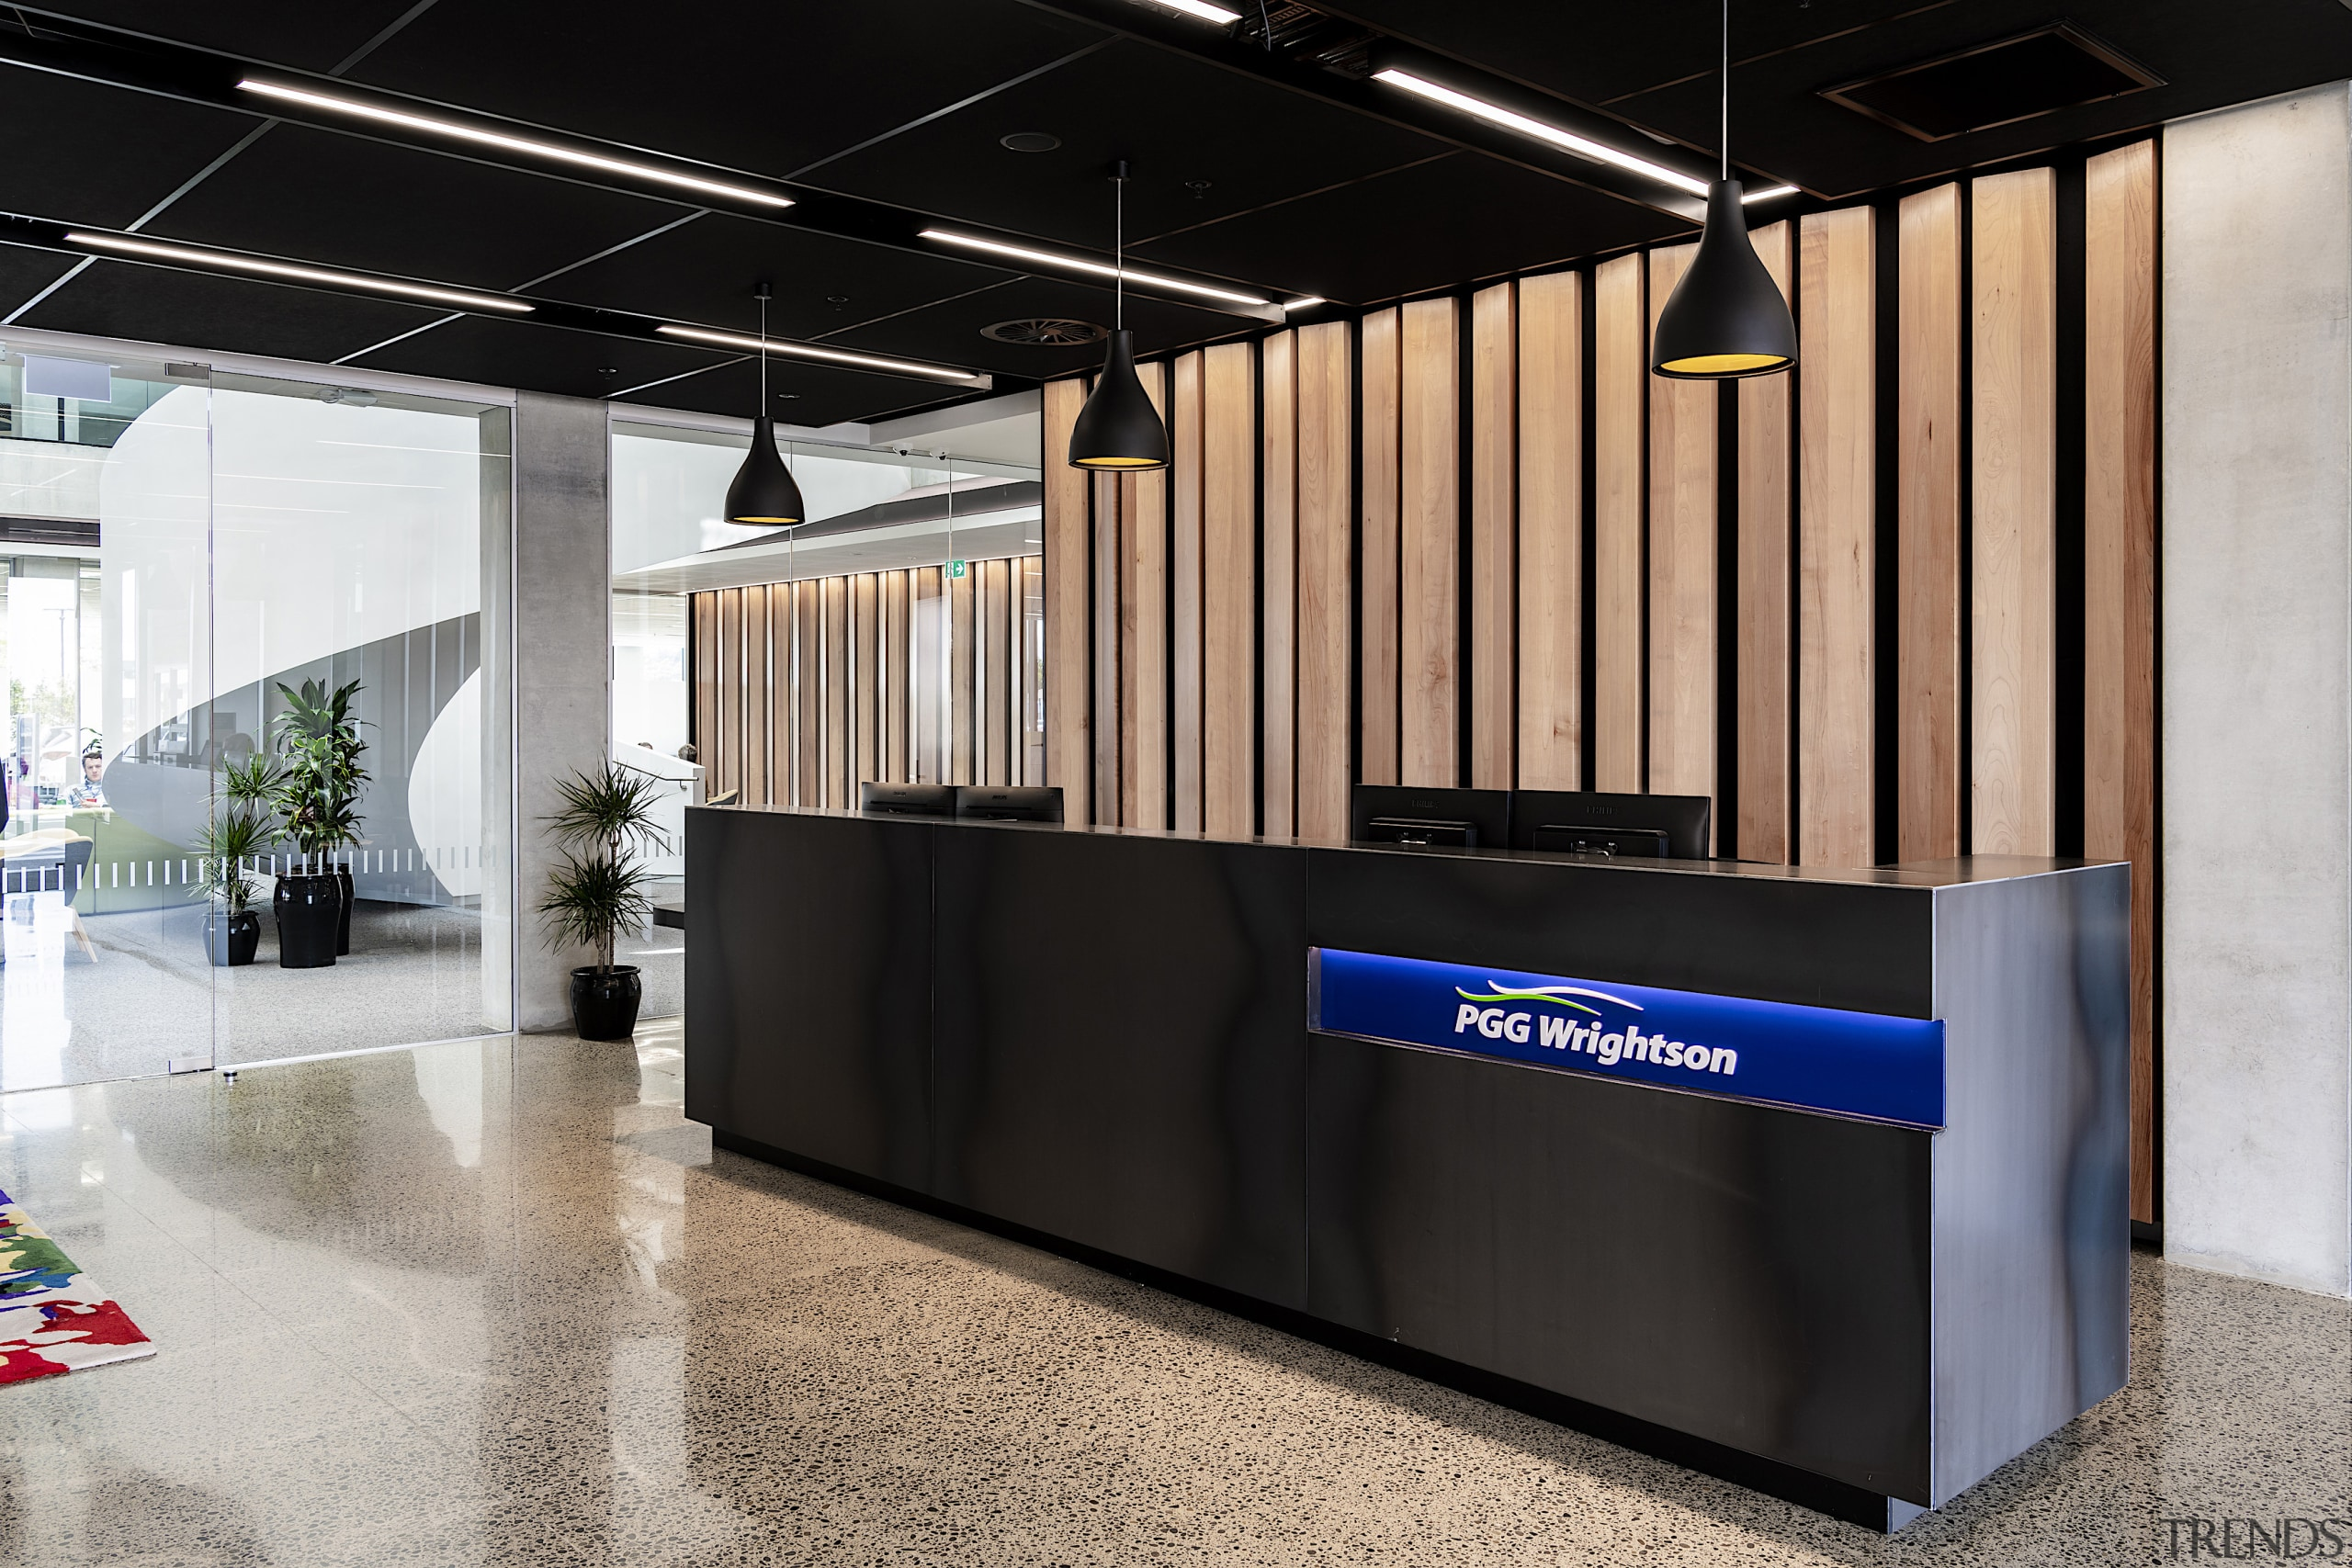 American beech panels behind the black reception desk